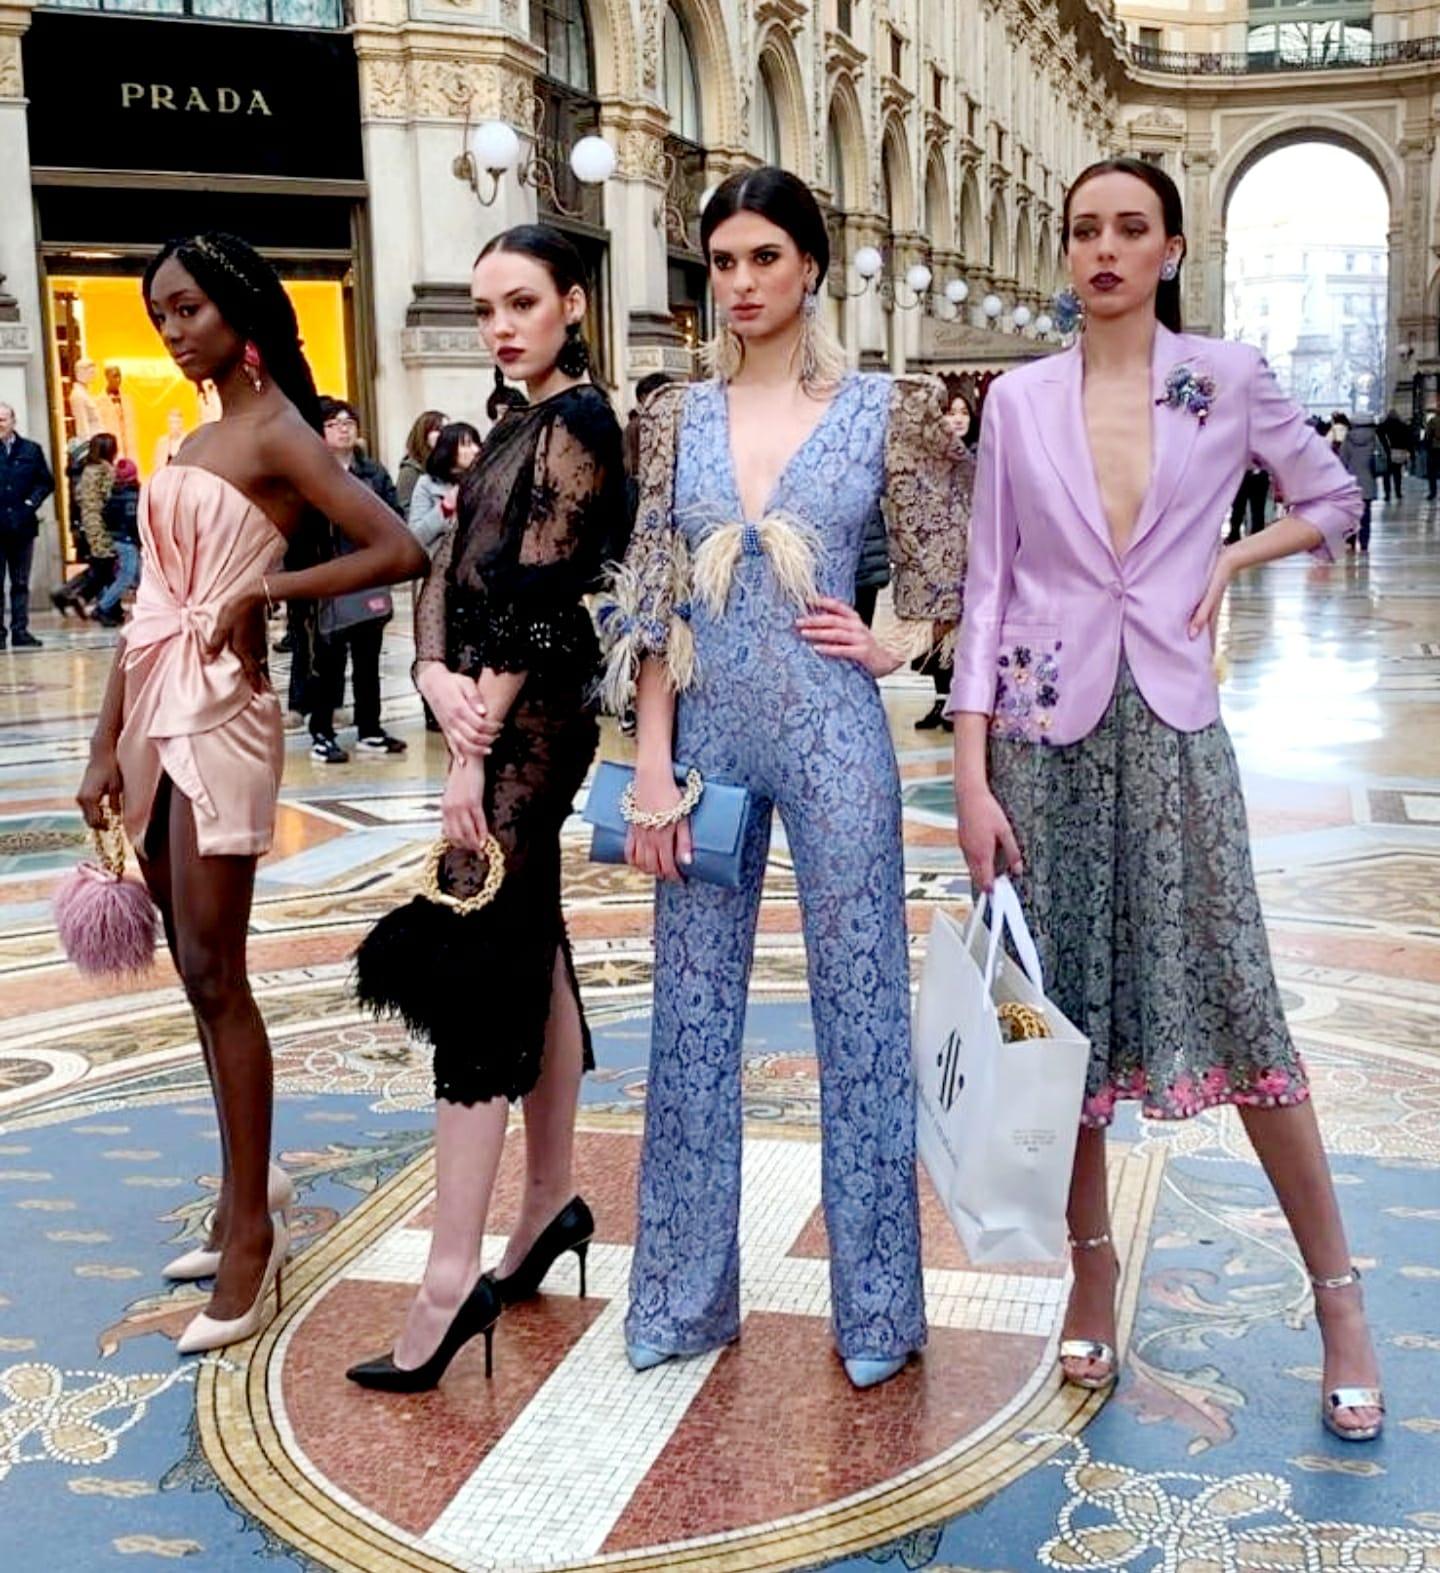 La Vanity Models di Francesco Pampa incanta Milano:successo per lo shooting in piazza